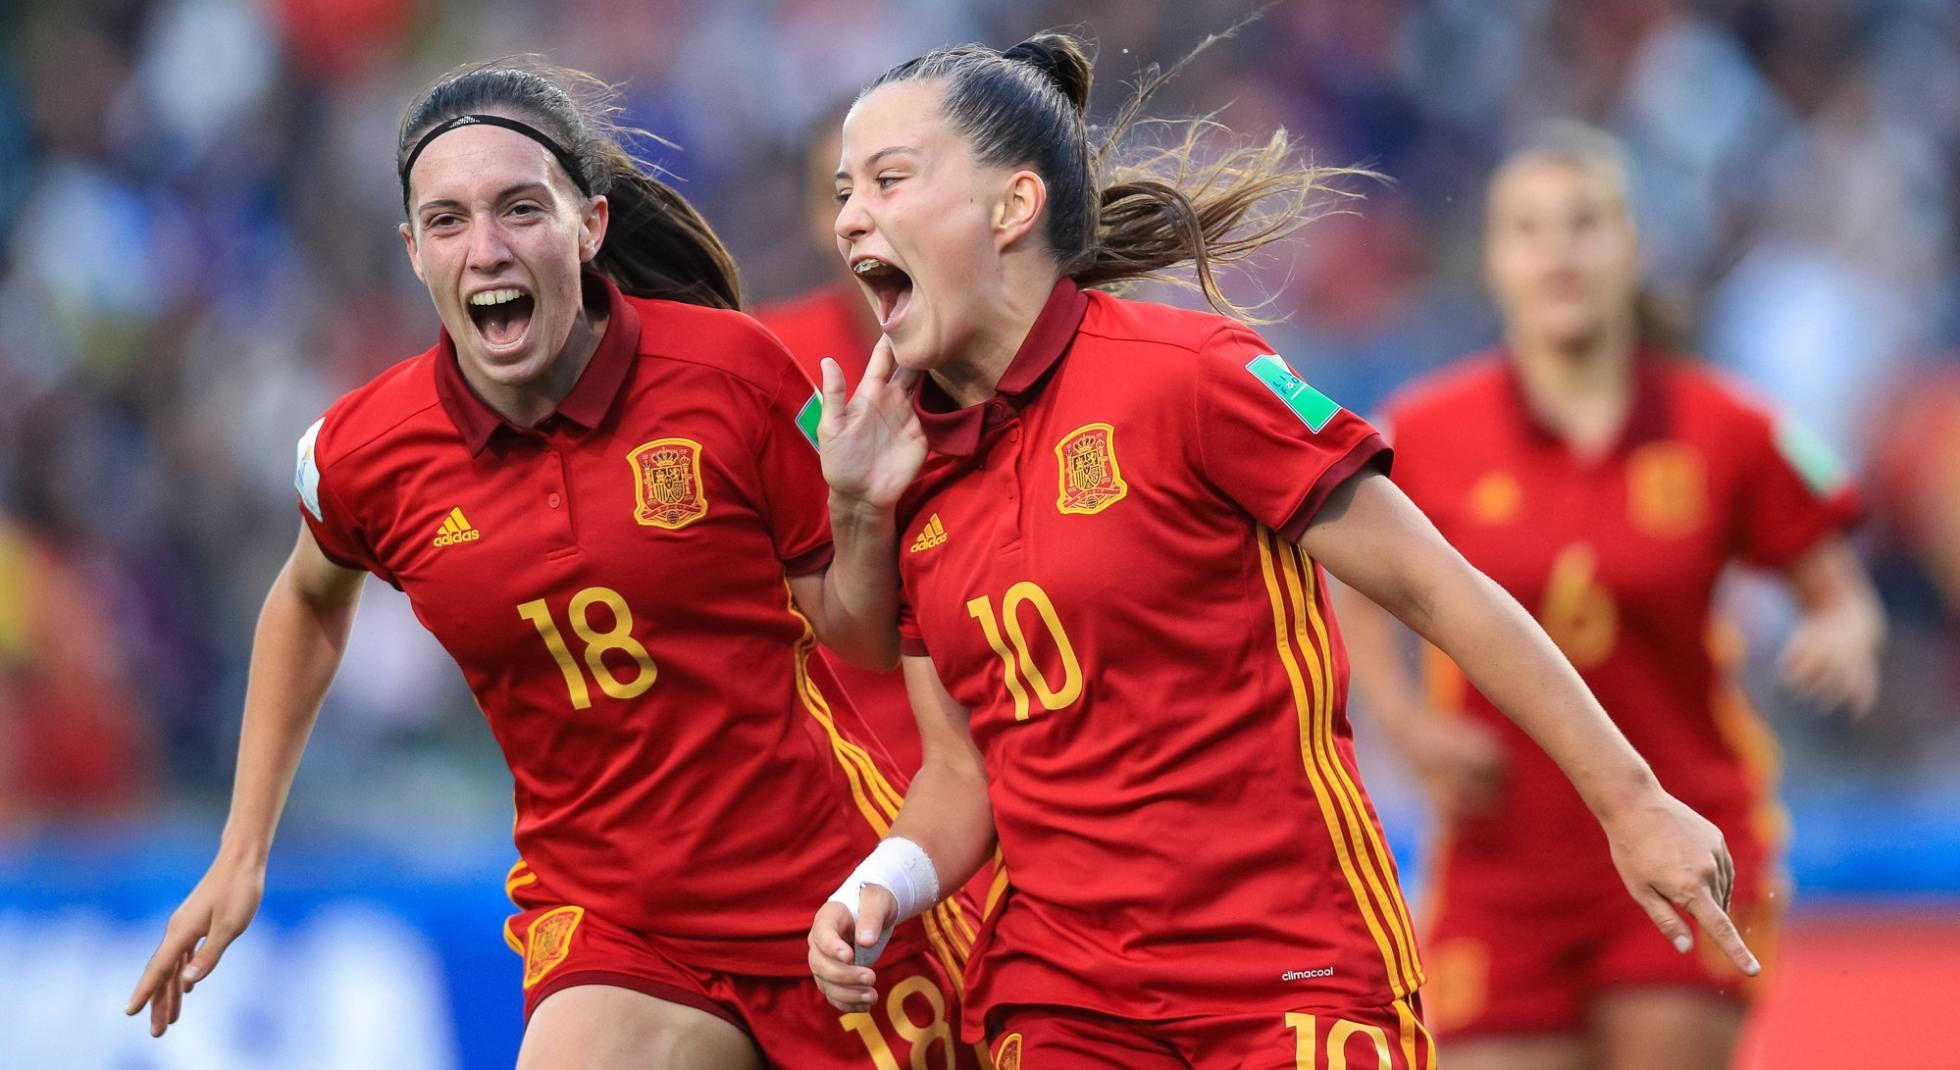 España gana el Mundial sub17 de fútbol femenino Futbol